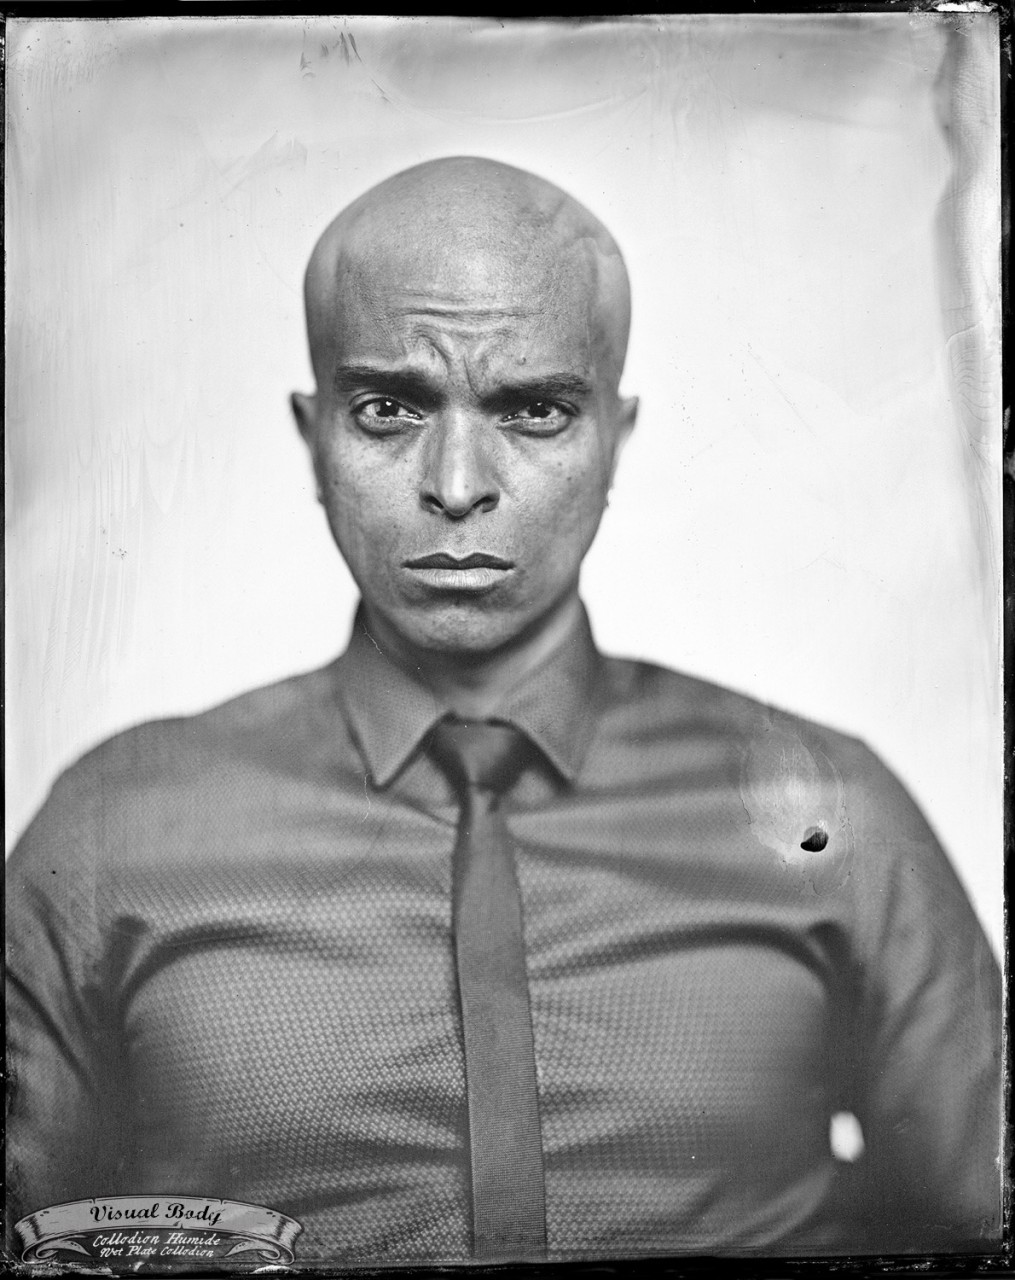 Rachid Badouri. Profession: humoriste/comedian.